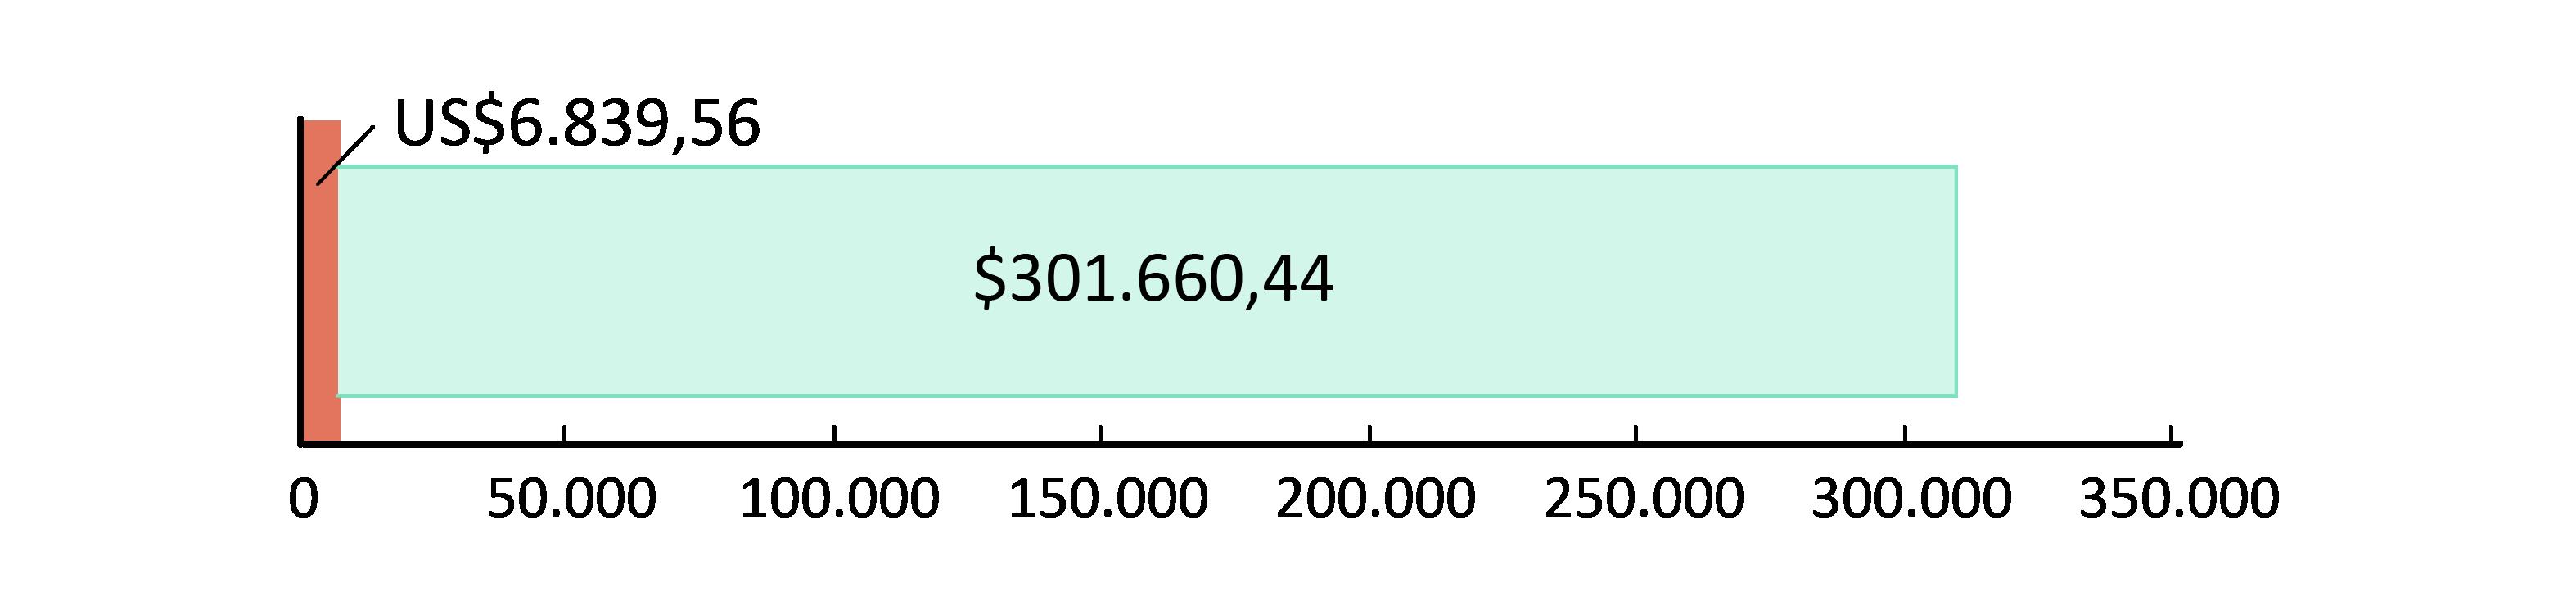 US$6,839.56 doados; US$301,660.44 previstos